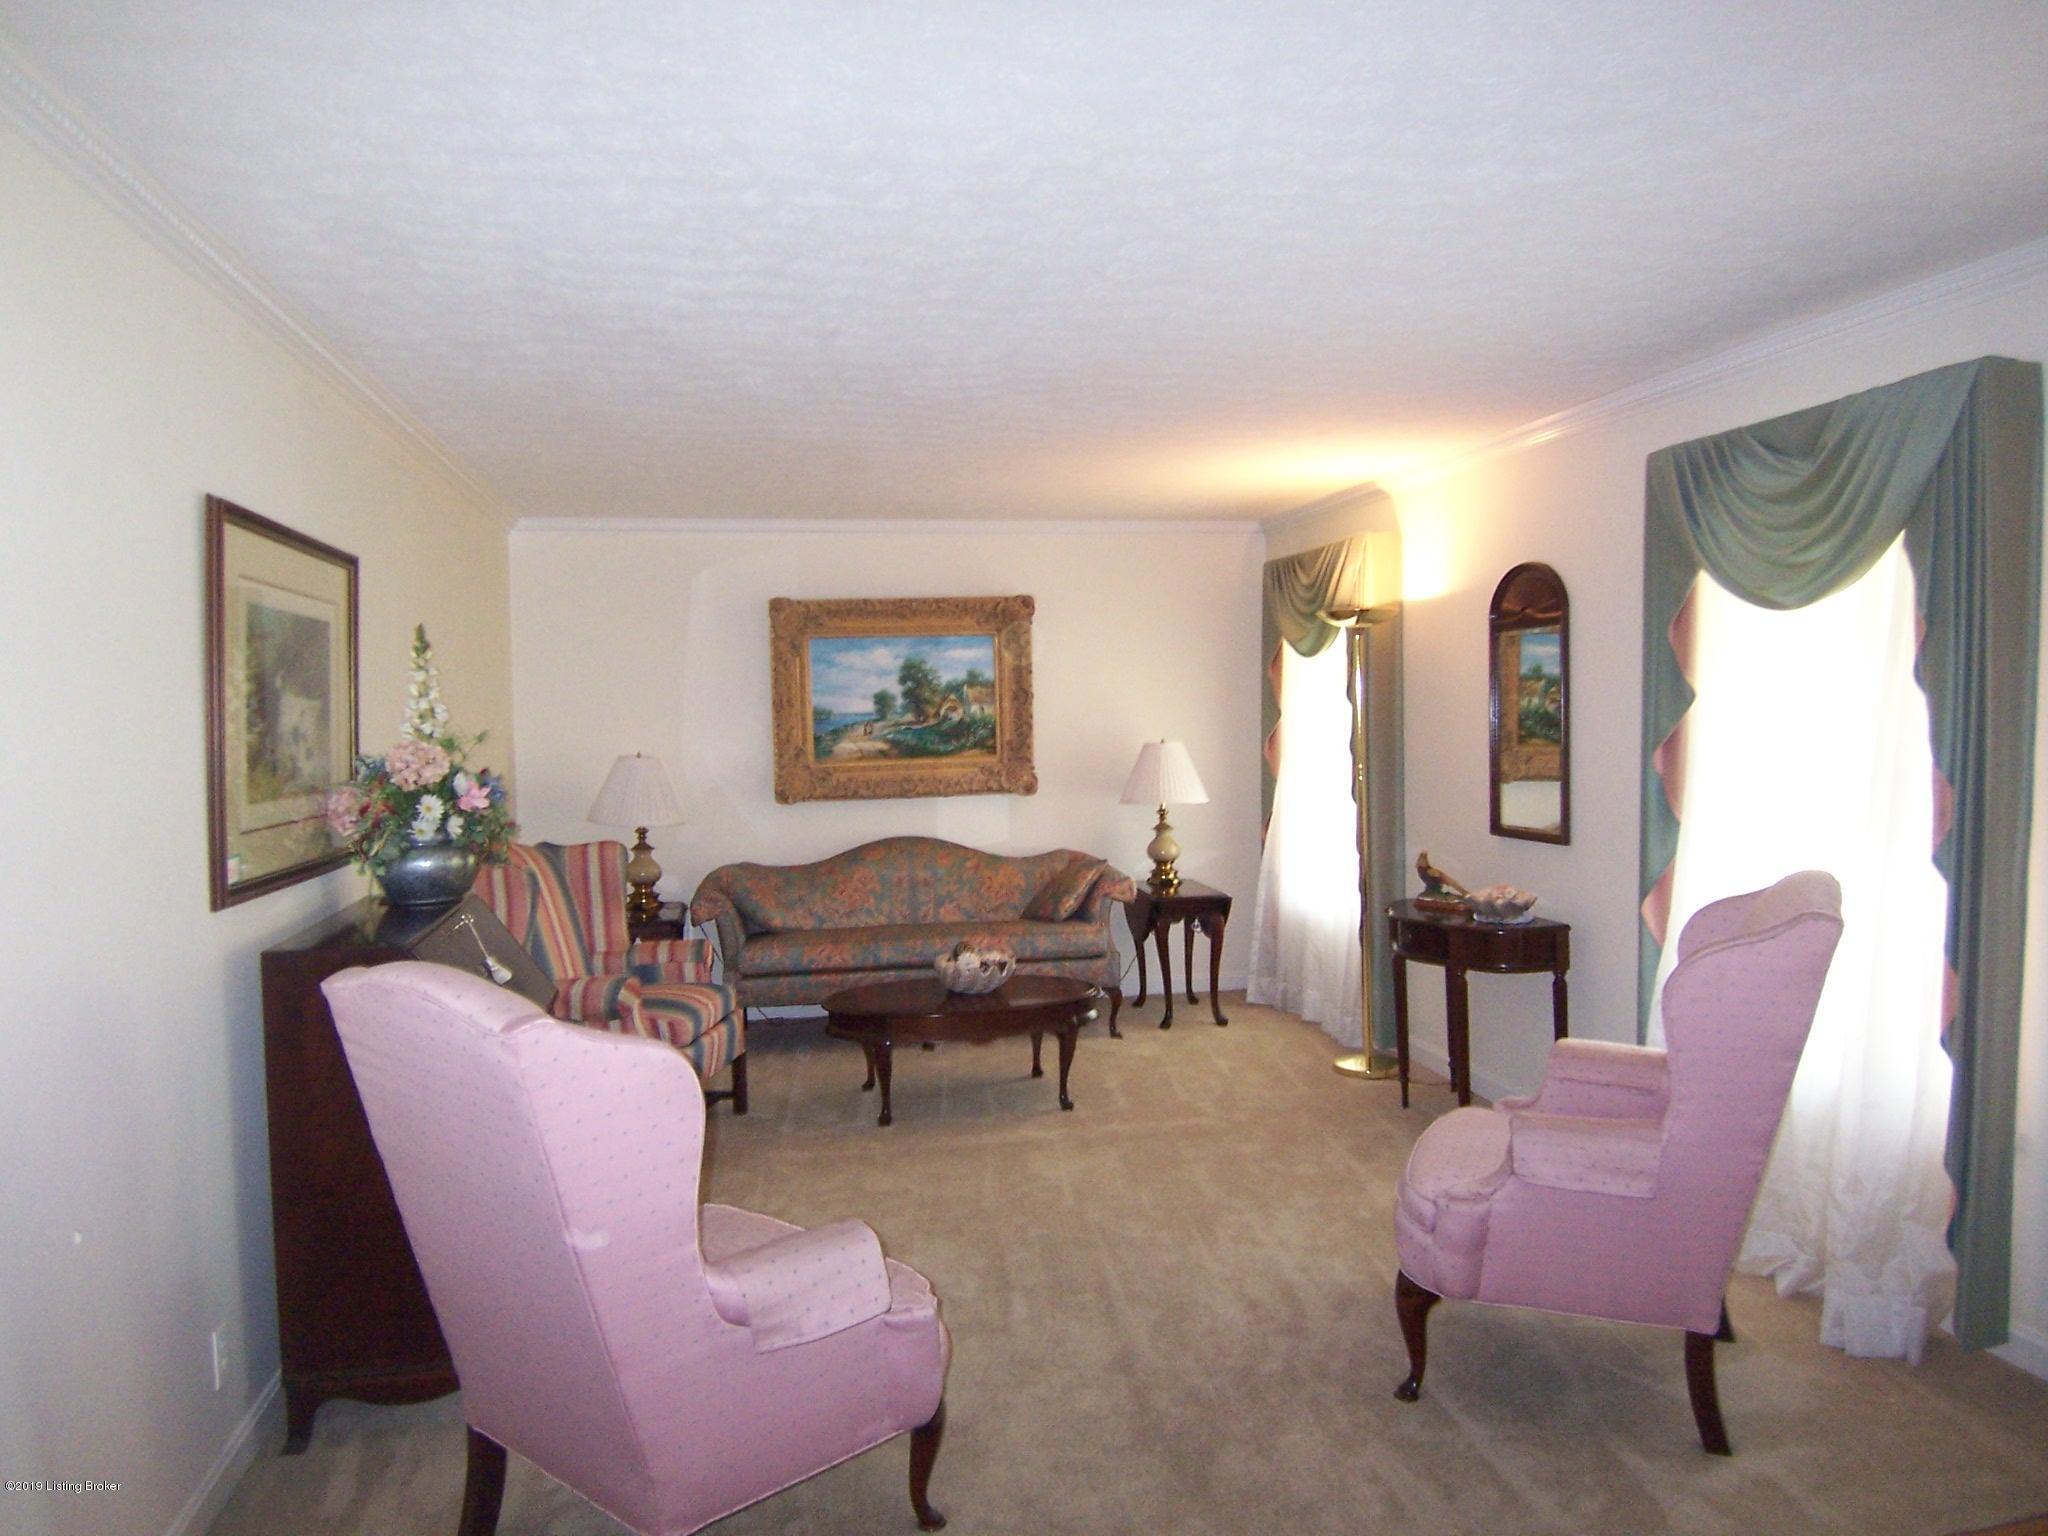 430 Bloomfield Rd, Bardstown, Kentucky 40004, 3 Bedrooms Bedrooms, 5 Rooms Rooms,3 BathroomsBathrooms,Residential,For Sale,Bloomfield,1529932